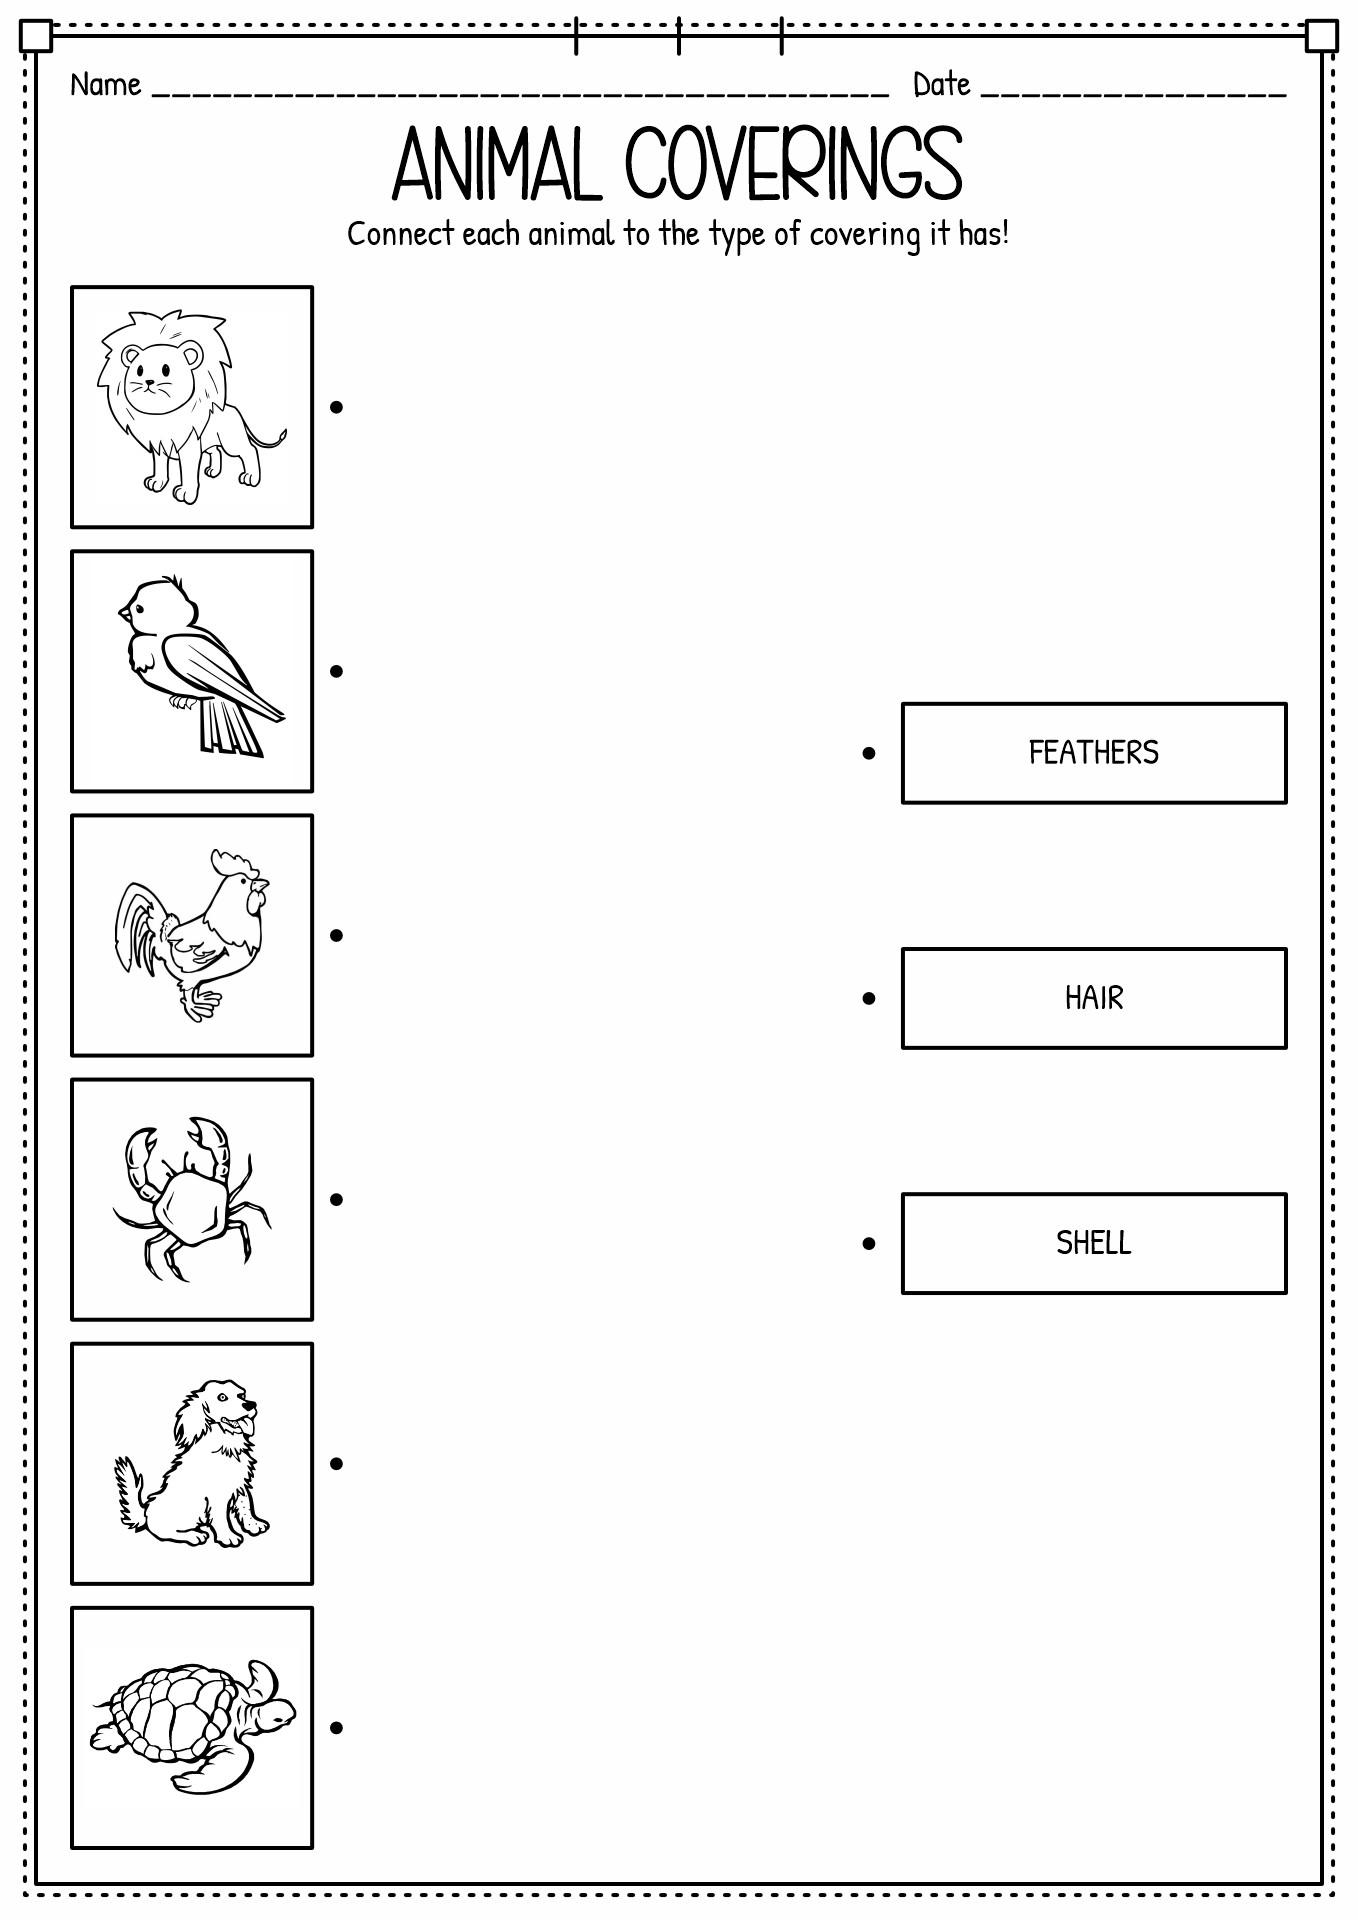 15 Best Images of Classifying Animals Worksheets Preschool